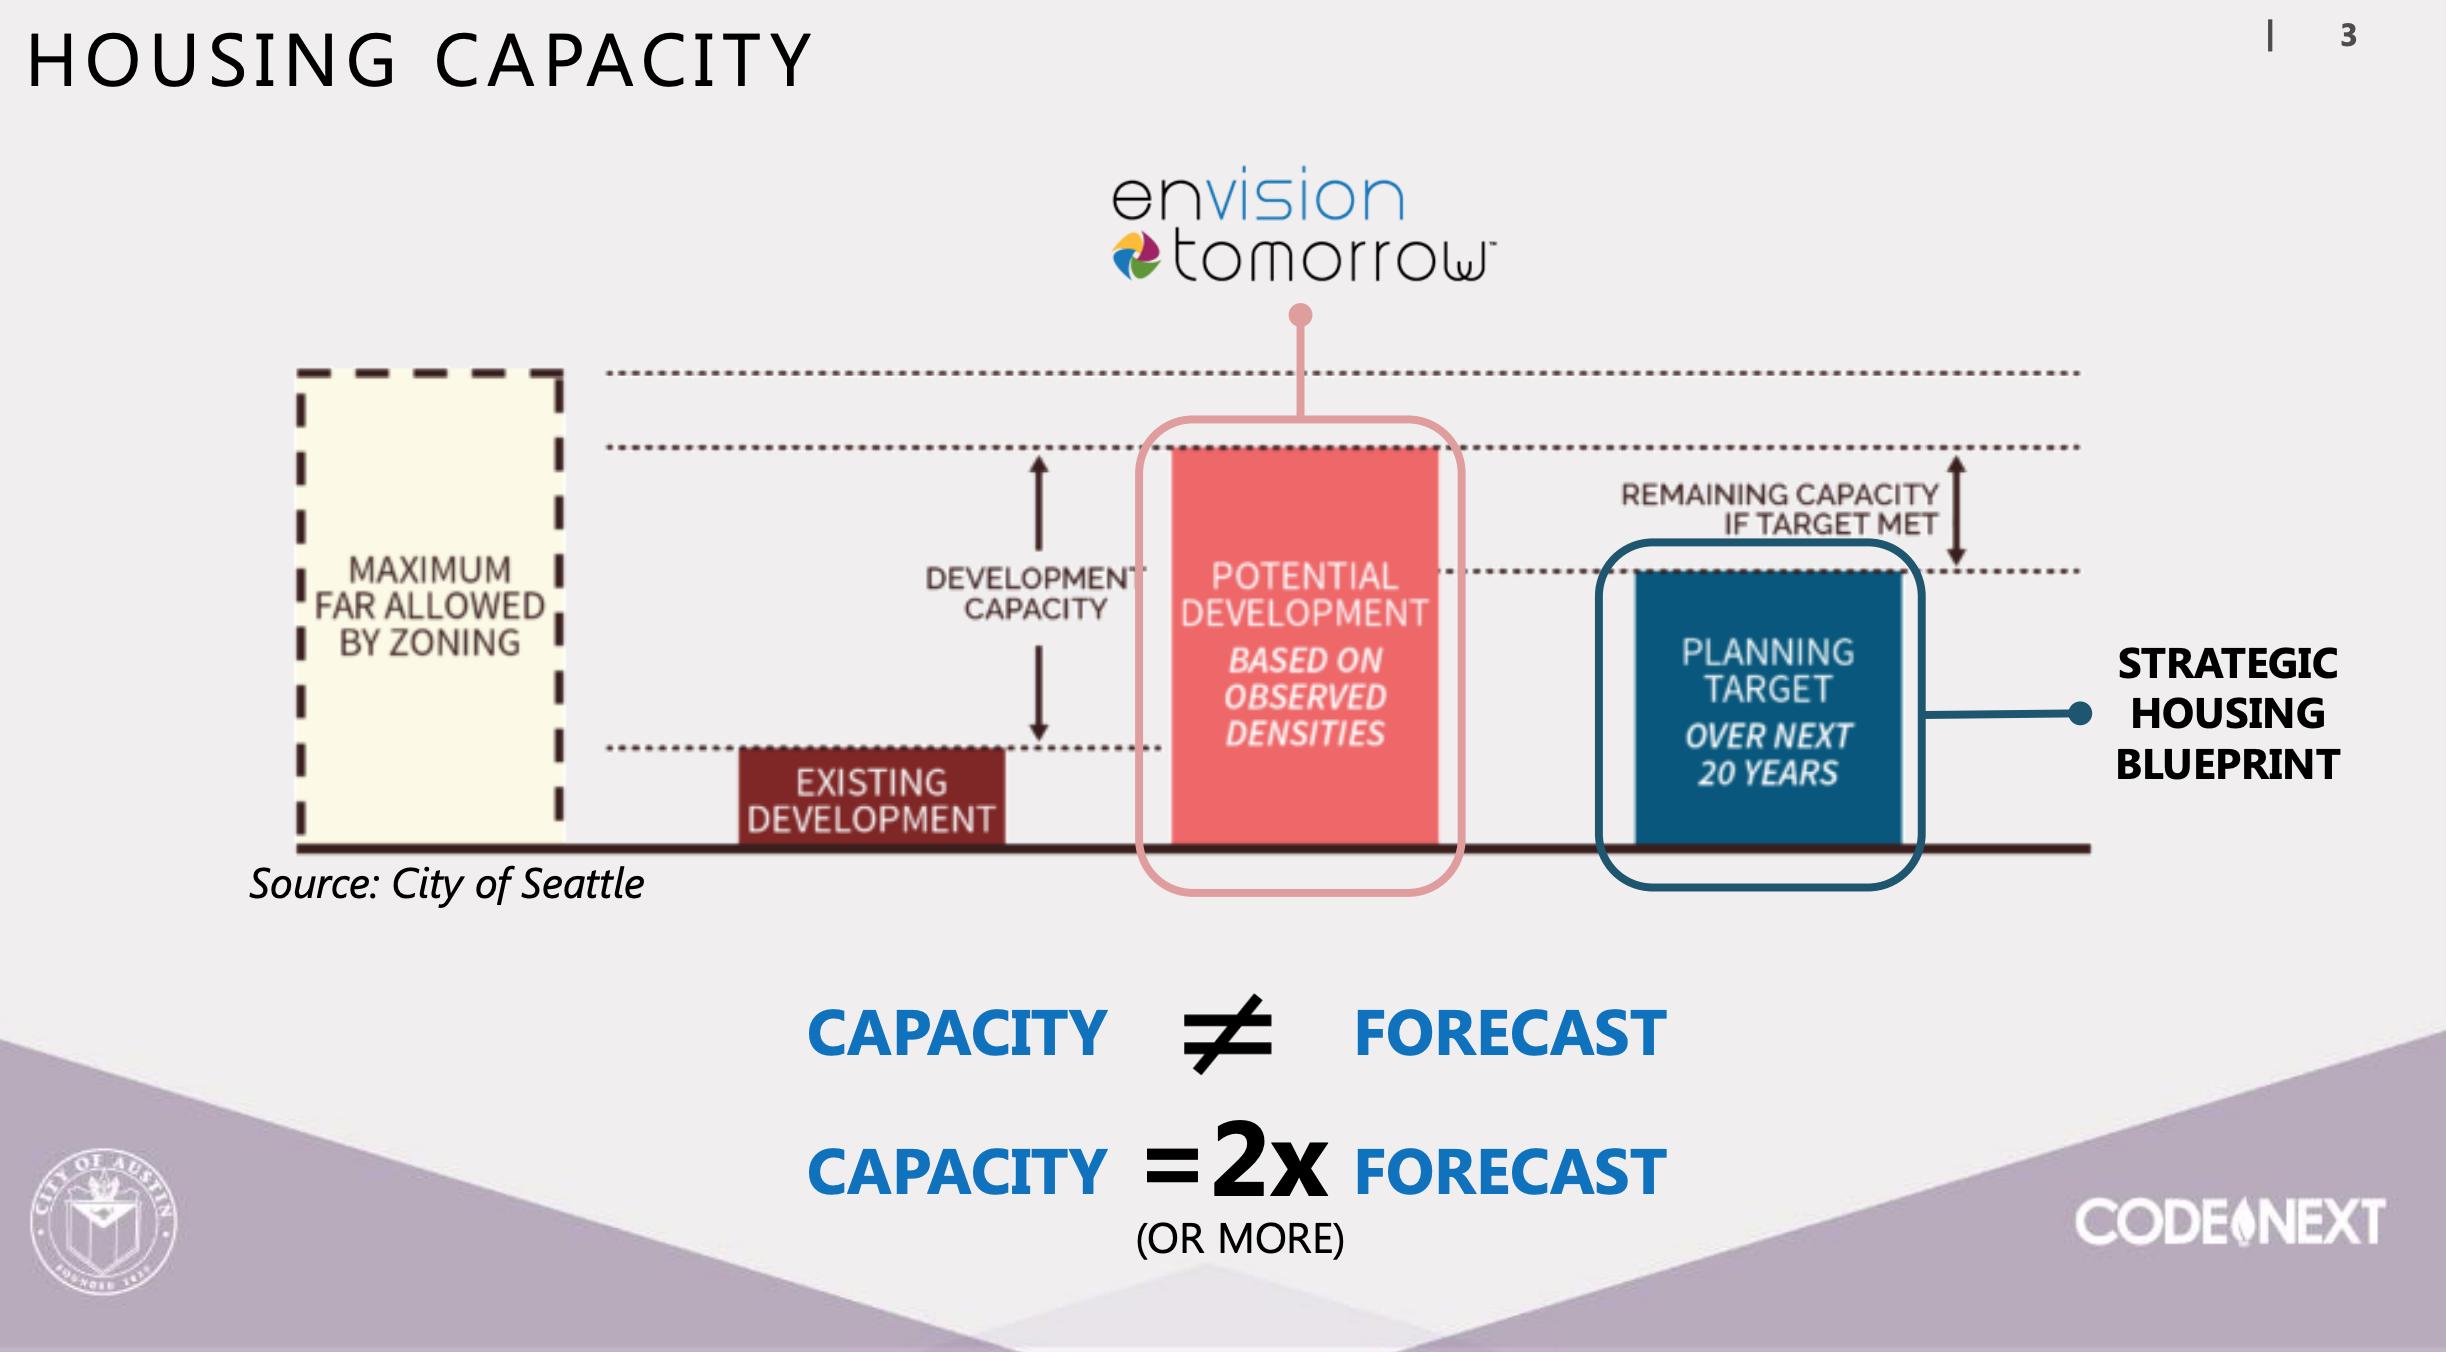 frego_envision_tomorrow_capacity